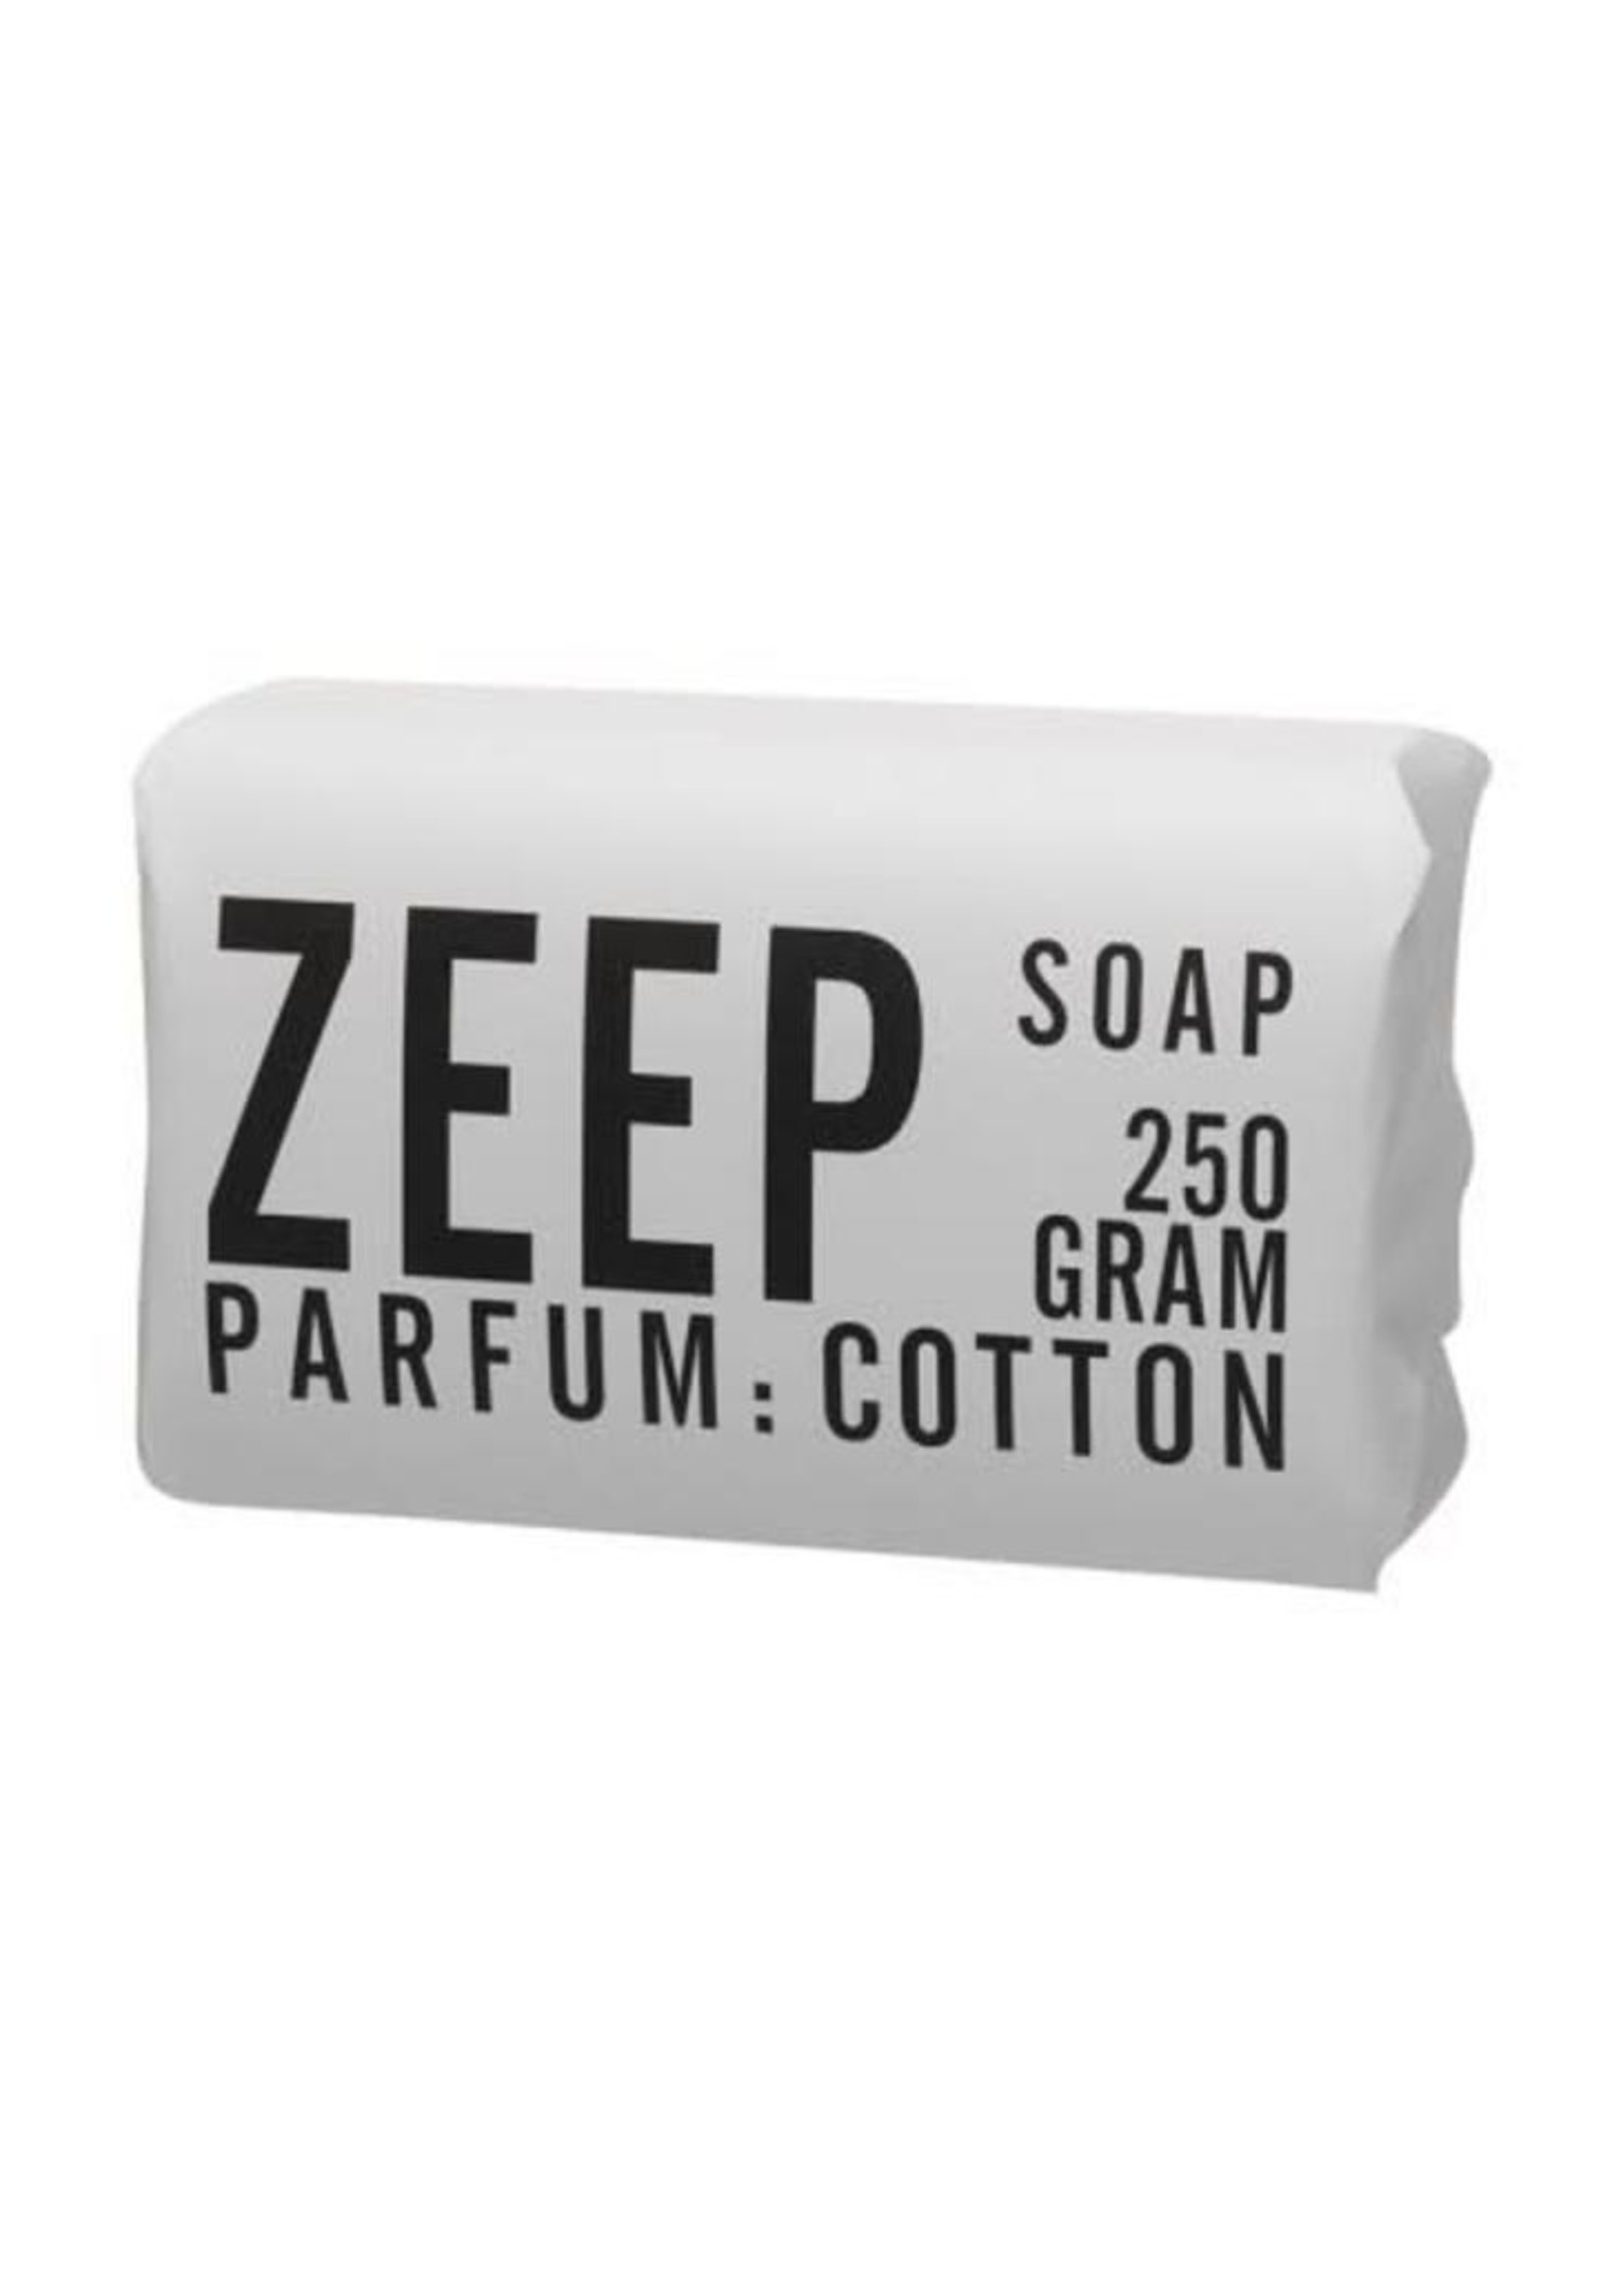 Mijn stijl Blok XL verpakt 250 gram parfum cotton